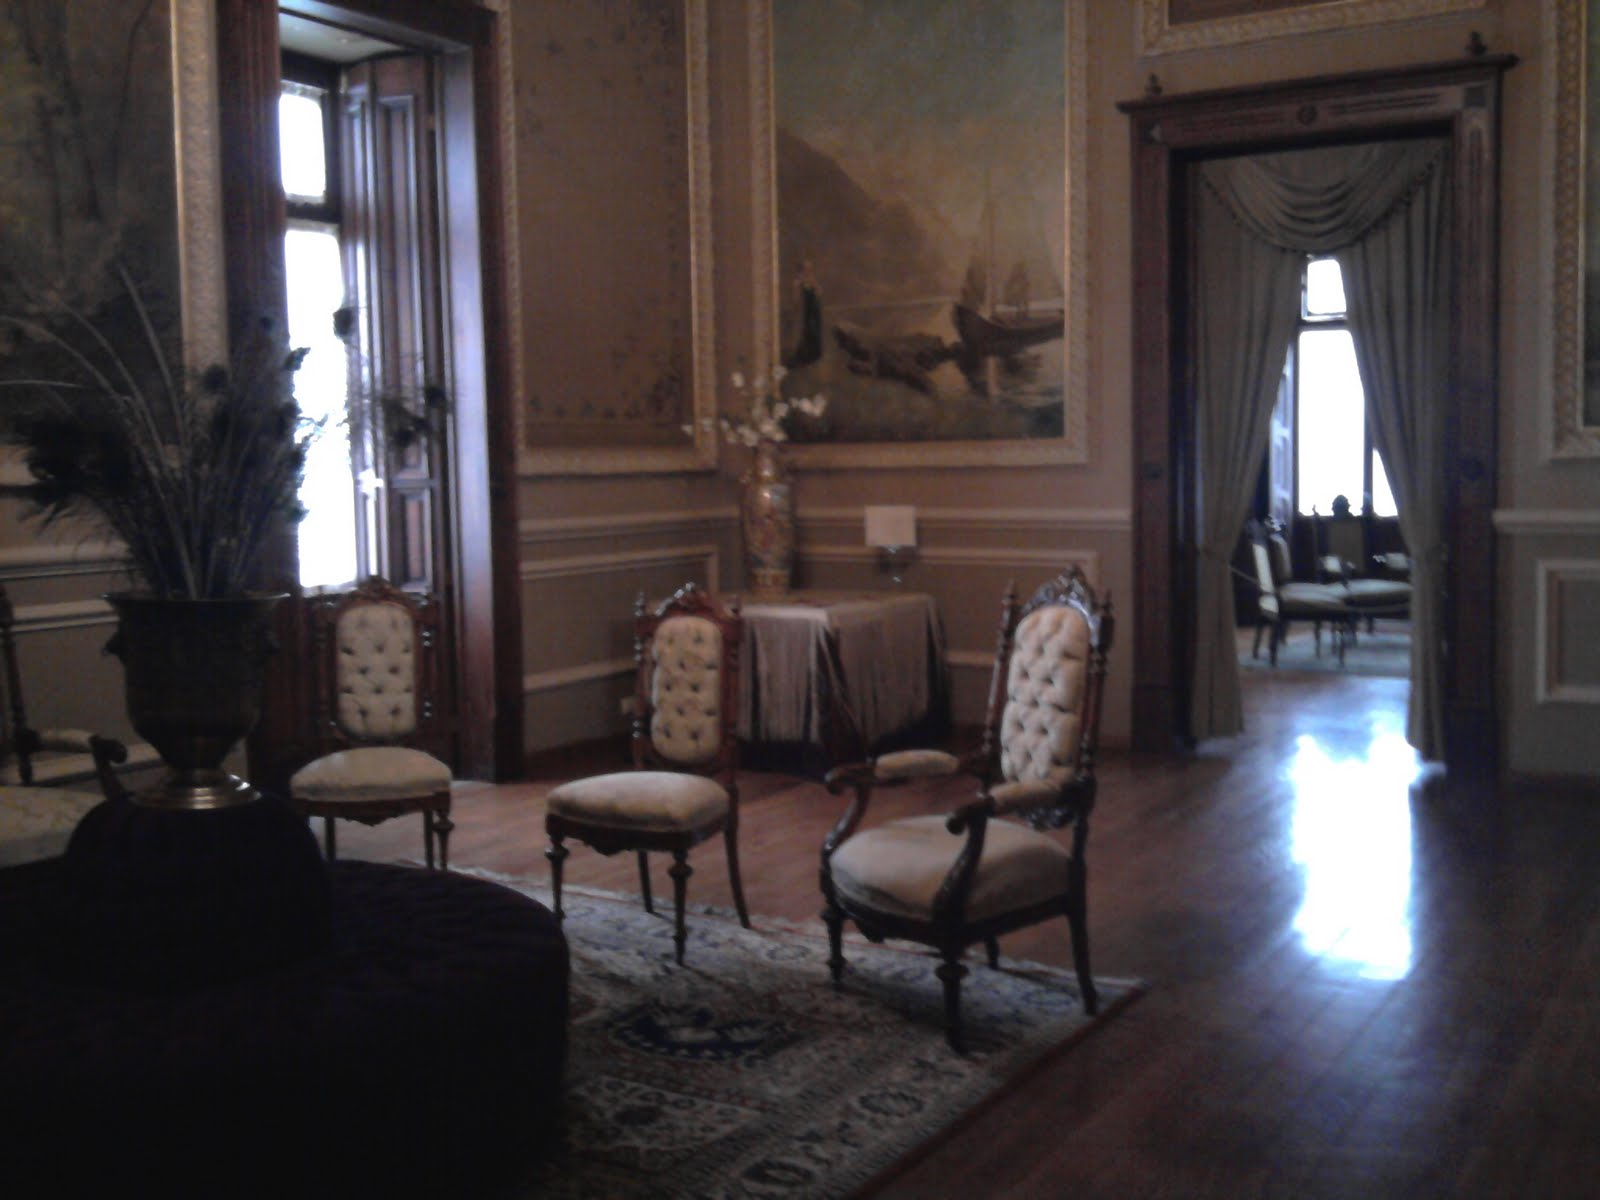 Fotos de sala de estar antiga id ias for Sala de estar antigua